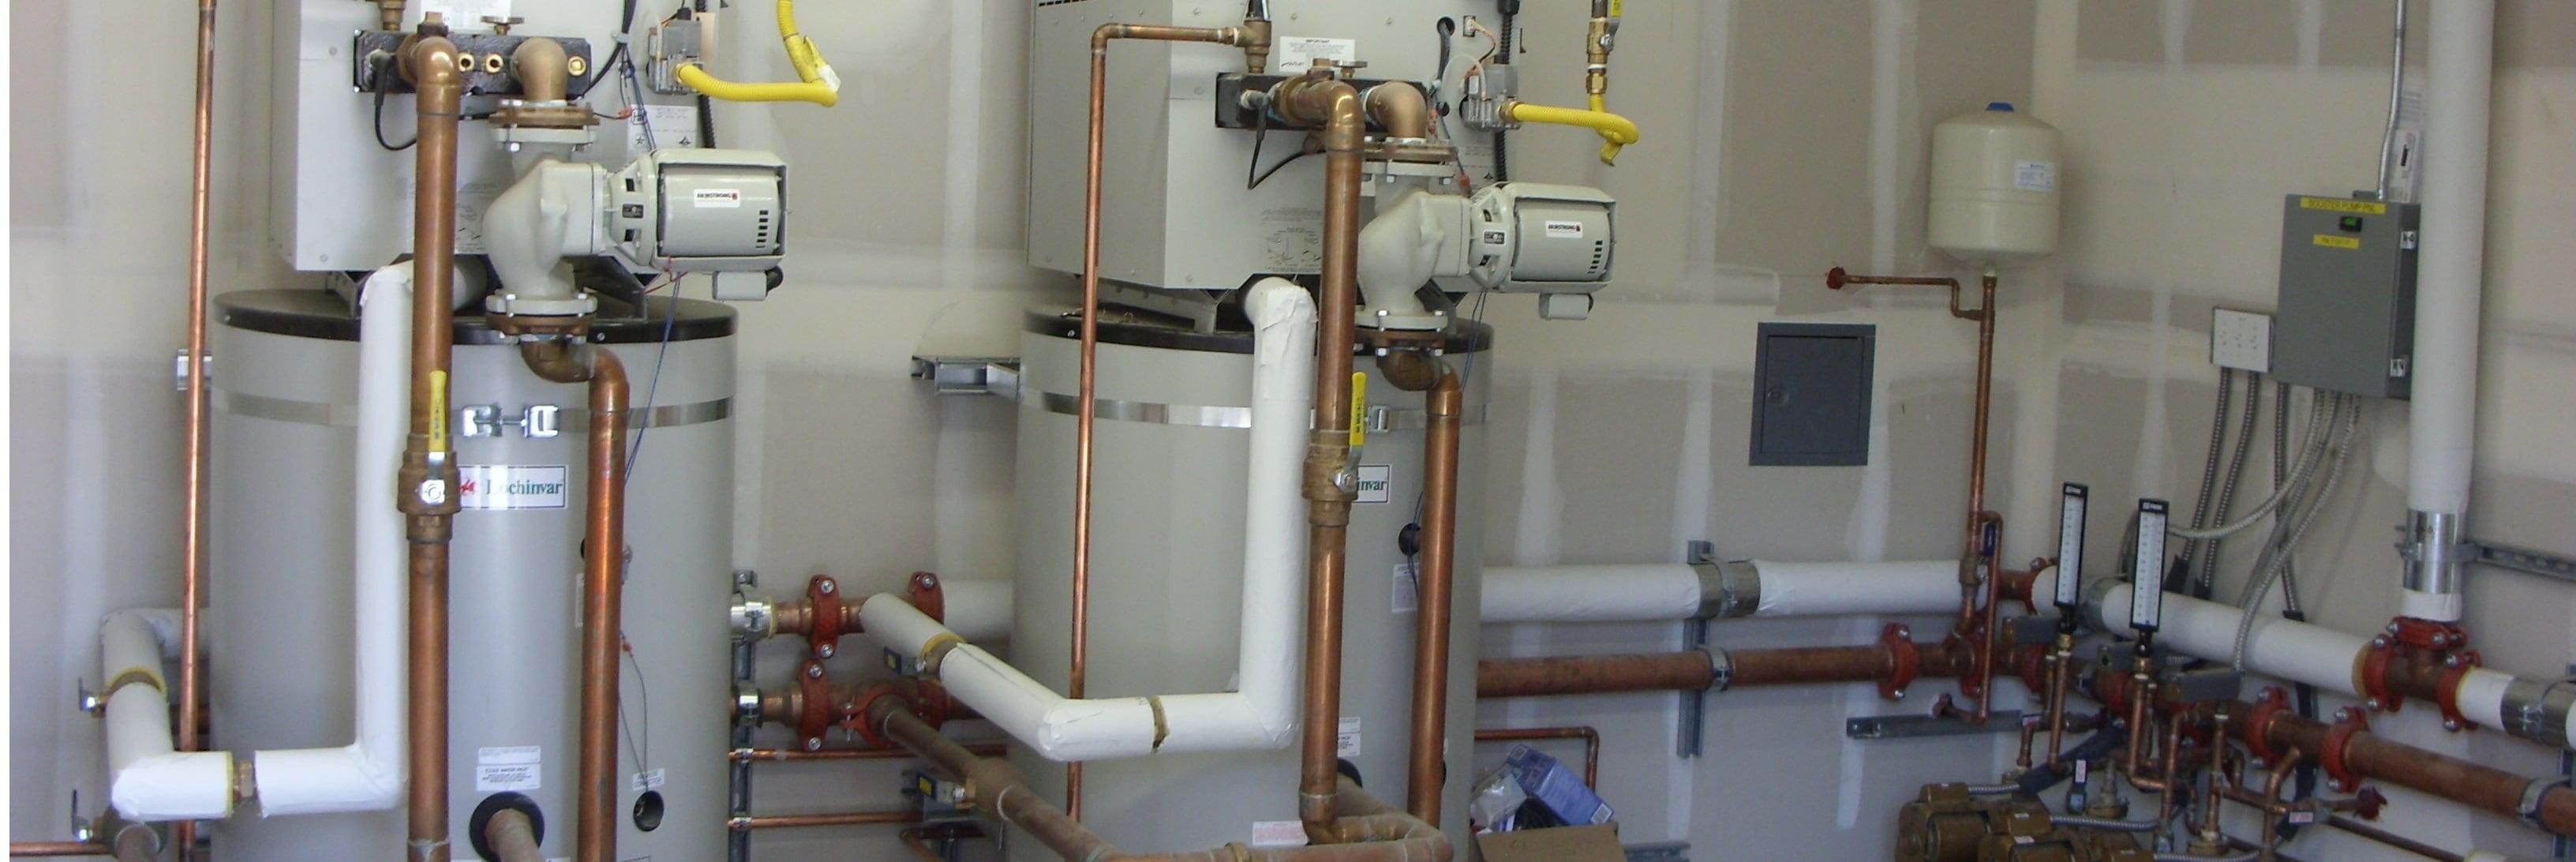 Commercial Plumbing System Naples, FL